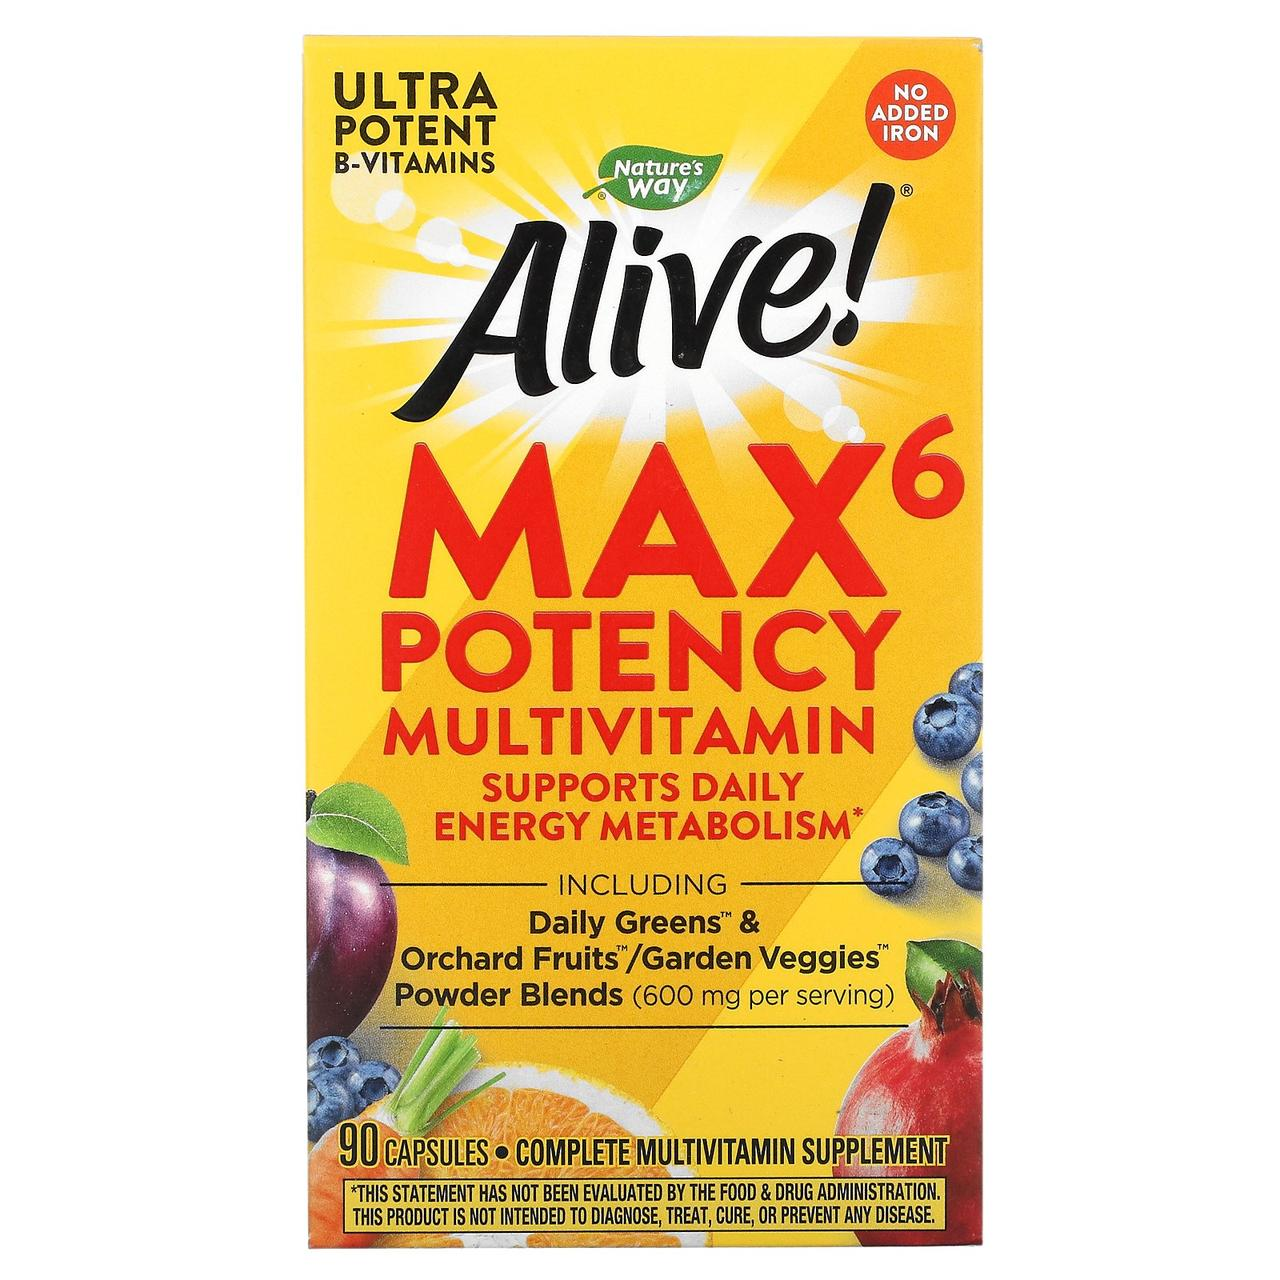 Мультивітаміни (Multi-Vitamin), nature's Way, без заліза, 90кап